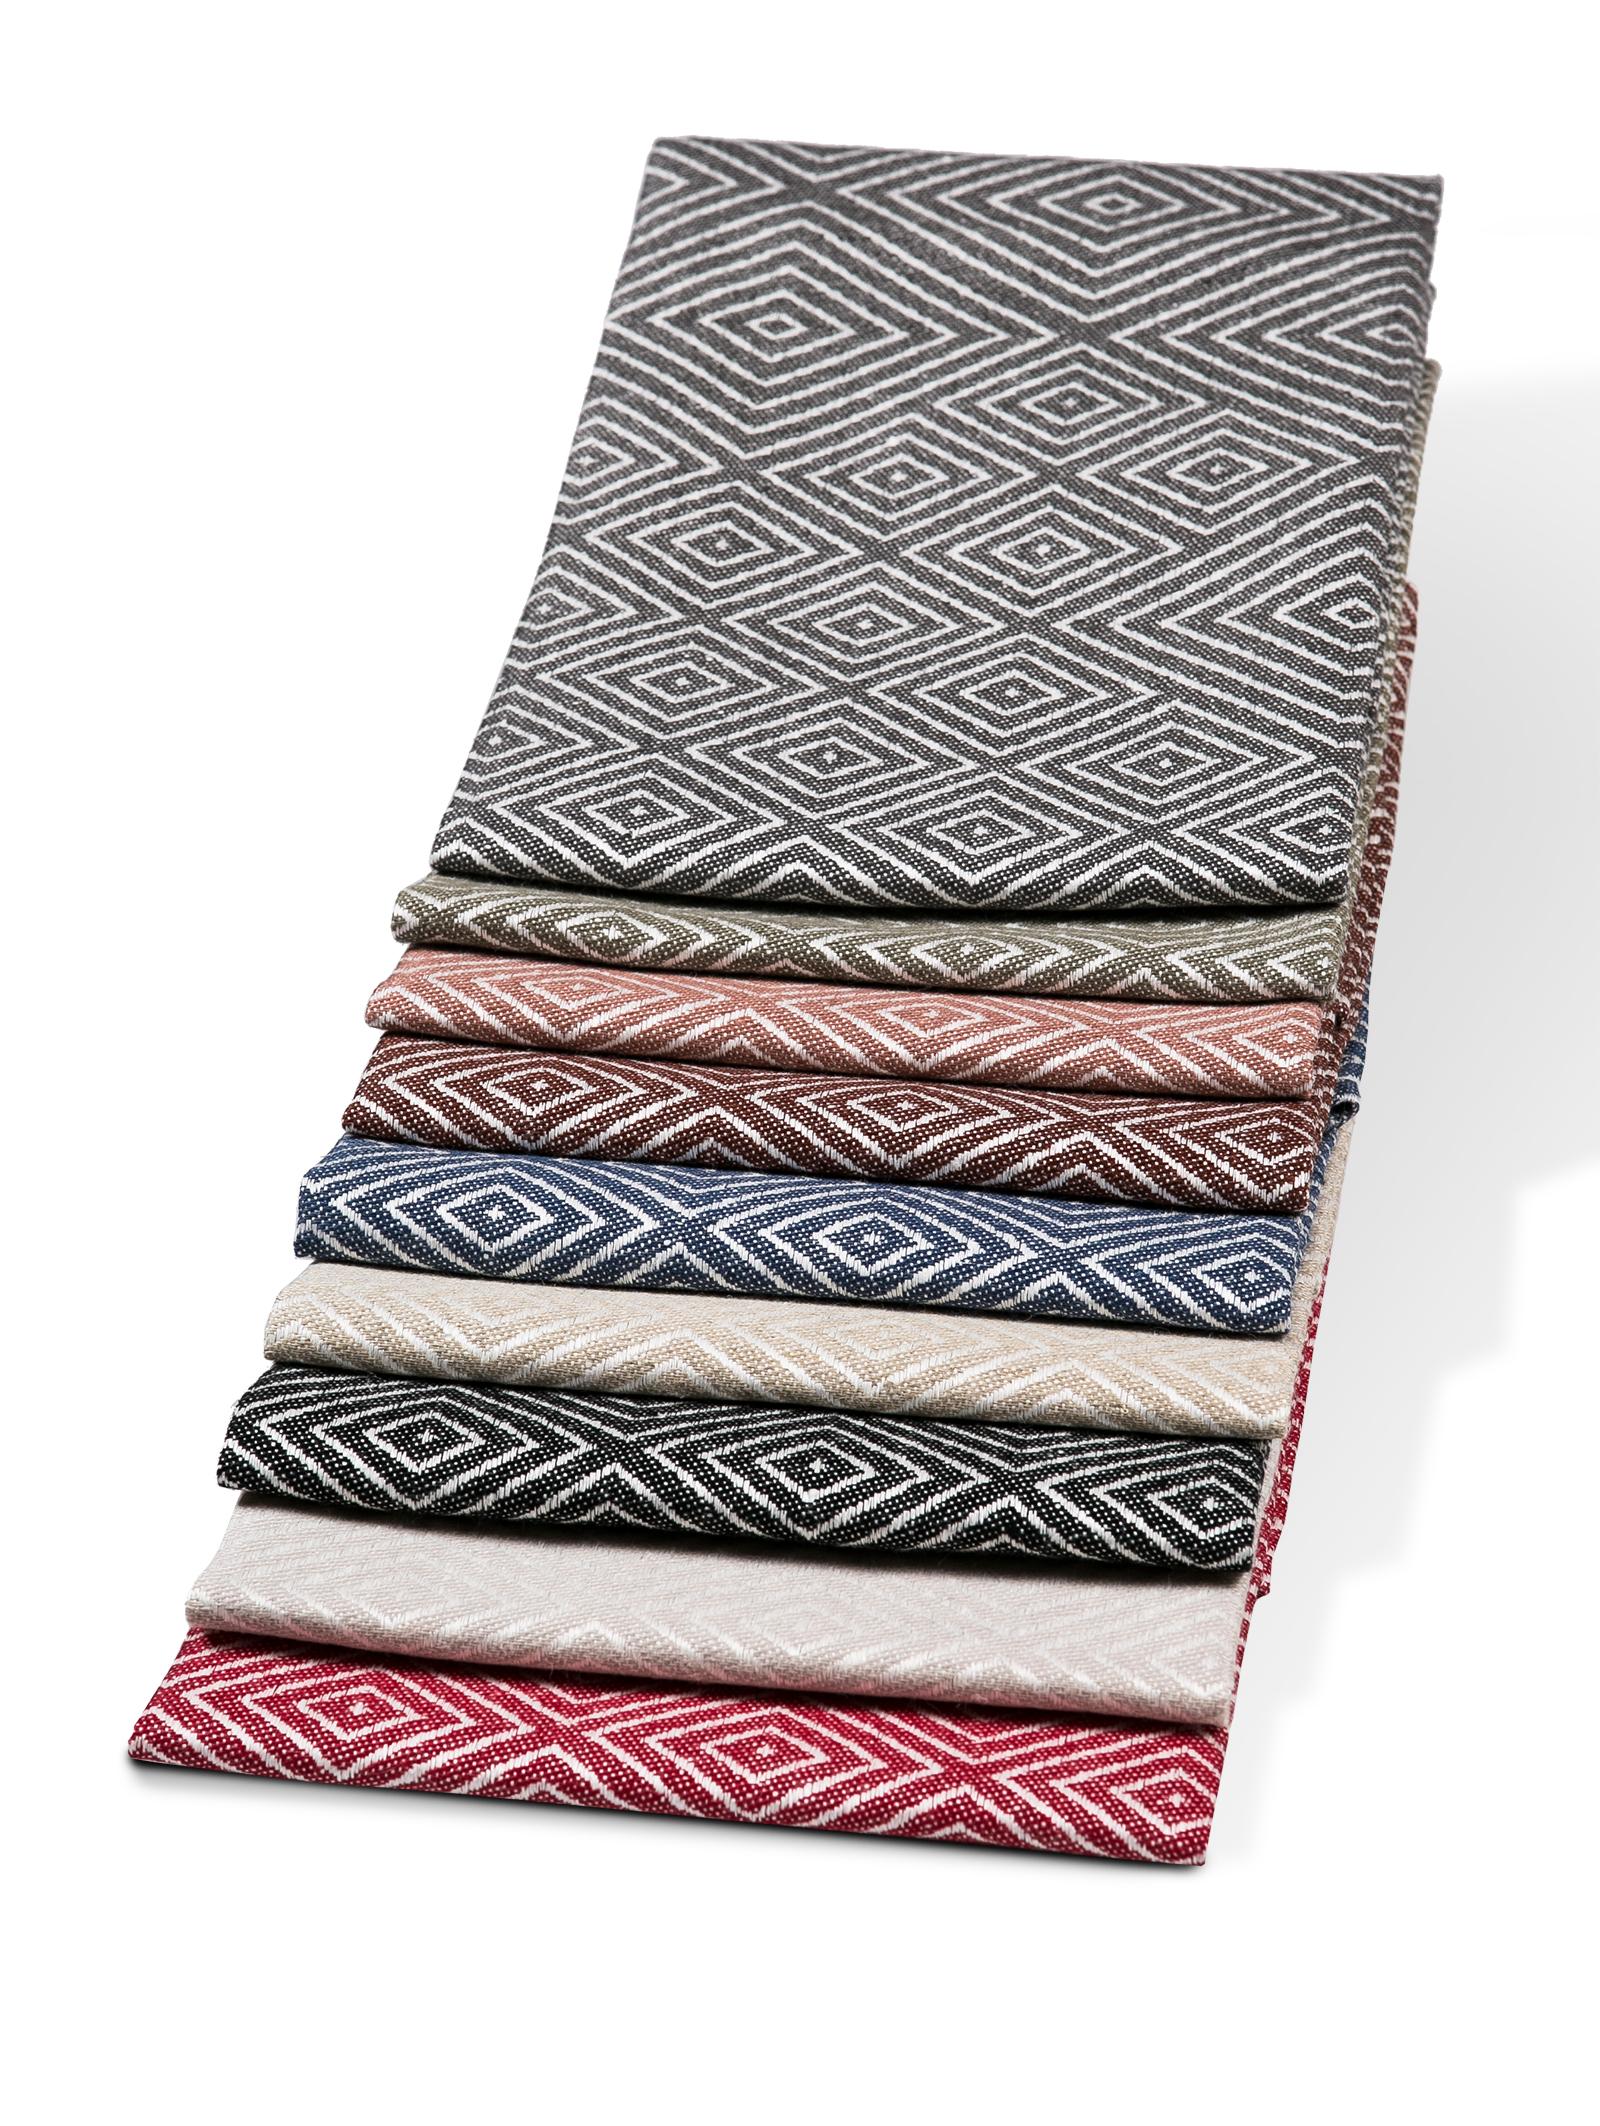 gasoga-hørhåndklæde-klassbols-linnevaveri